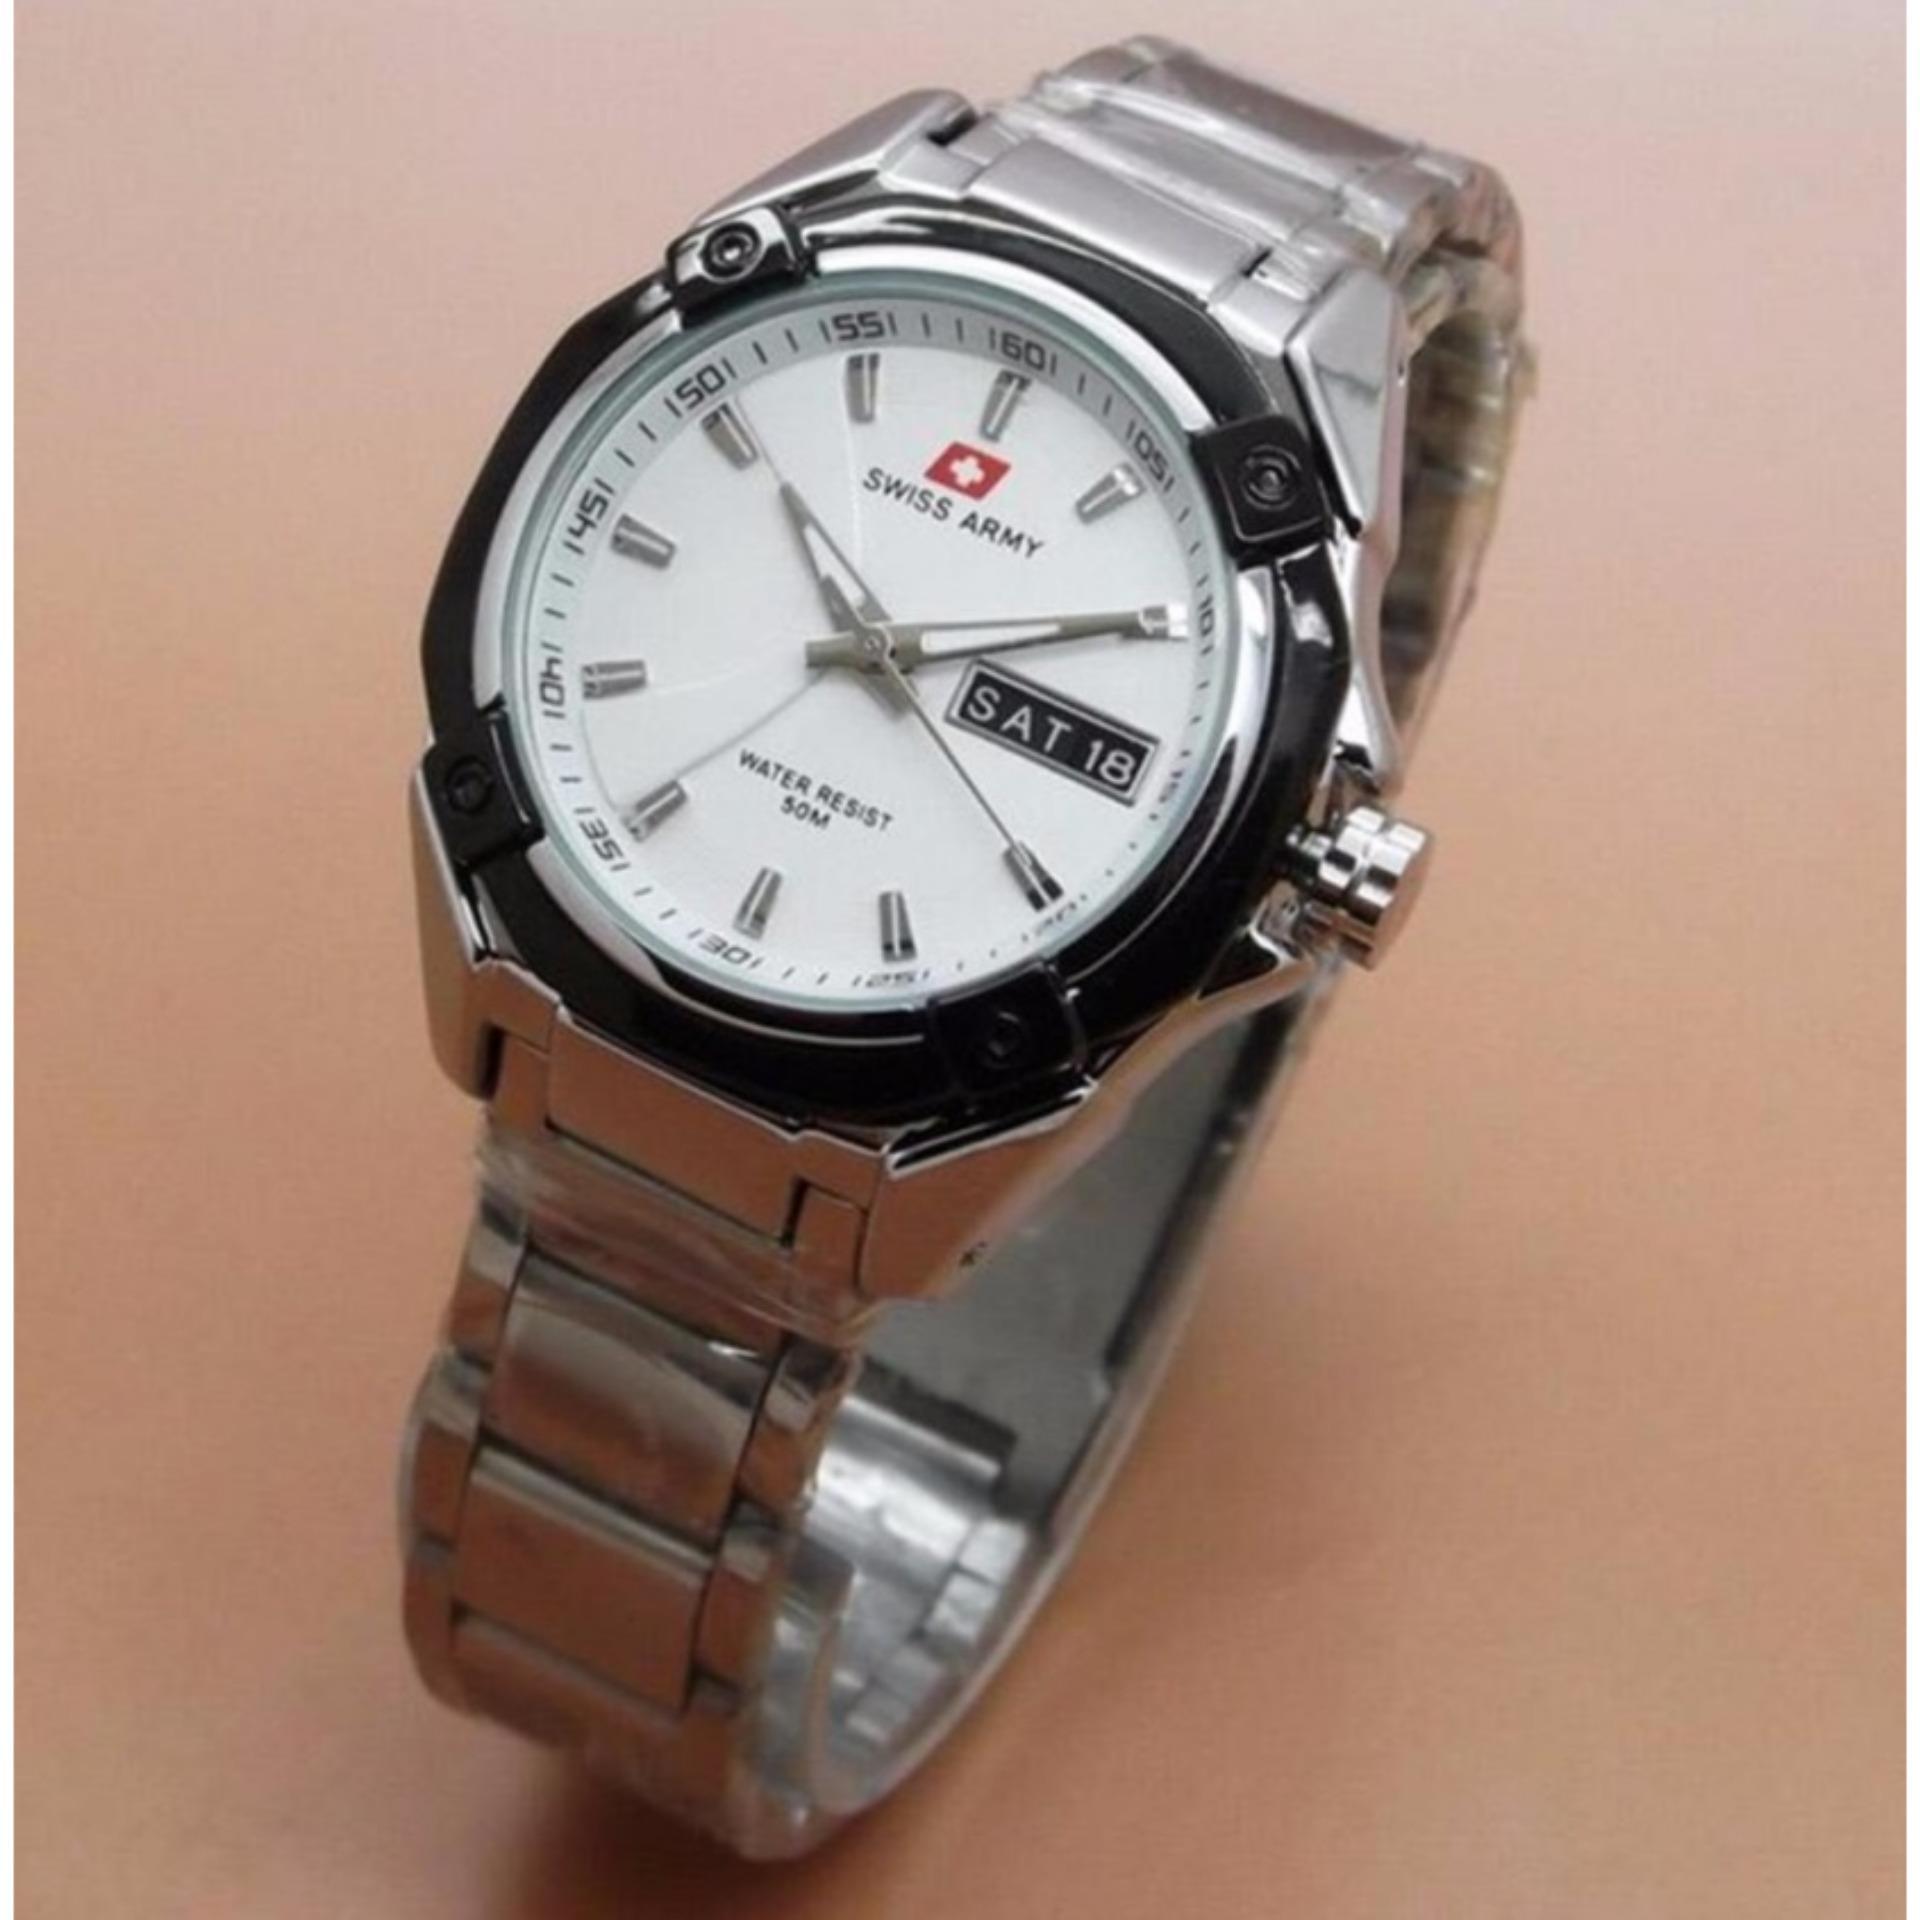 ... Swiss Army Analog Jam Tangan Pria Silver Hitam Strap Rantai 1475m Source Jam Tangan Wanita Swiss